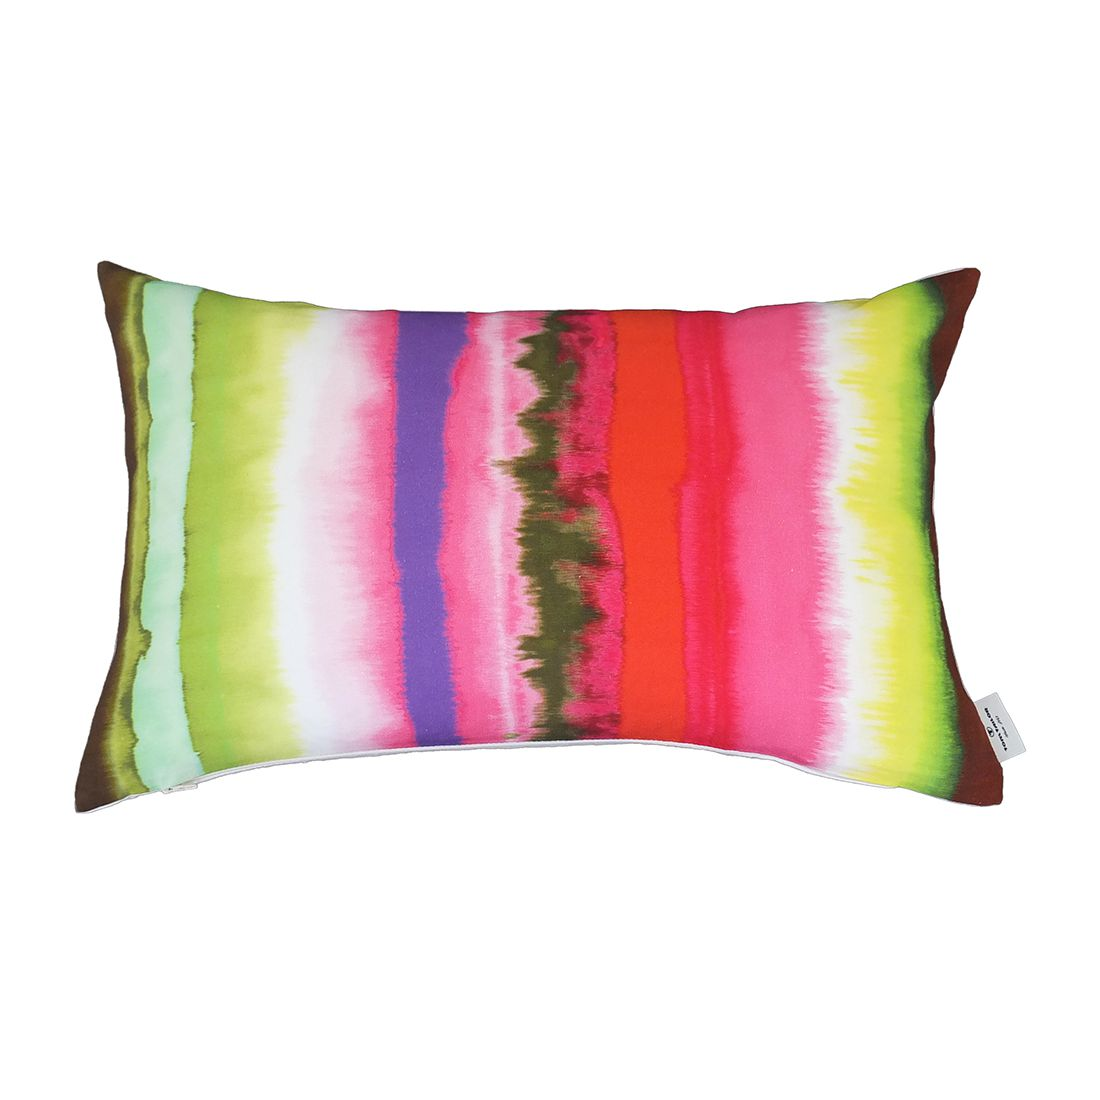 Kissenhülle T-Rainbow – Multicolor – Maße: 35 x 55 cm, Tom Tailor kaufen